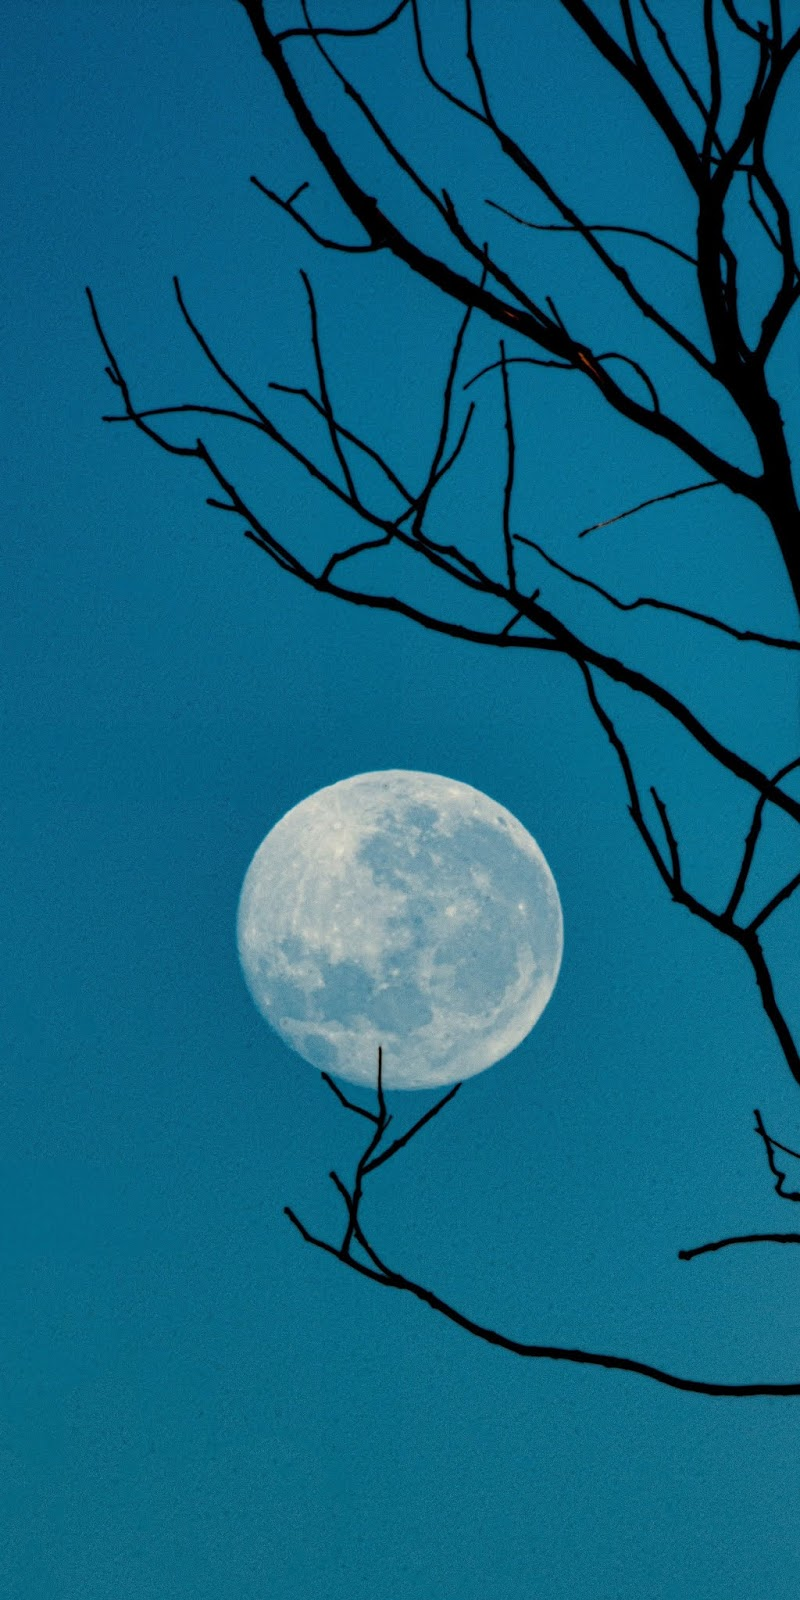 Full moon in blue night